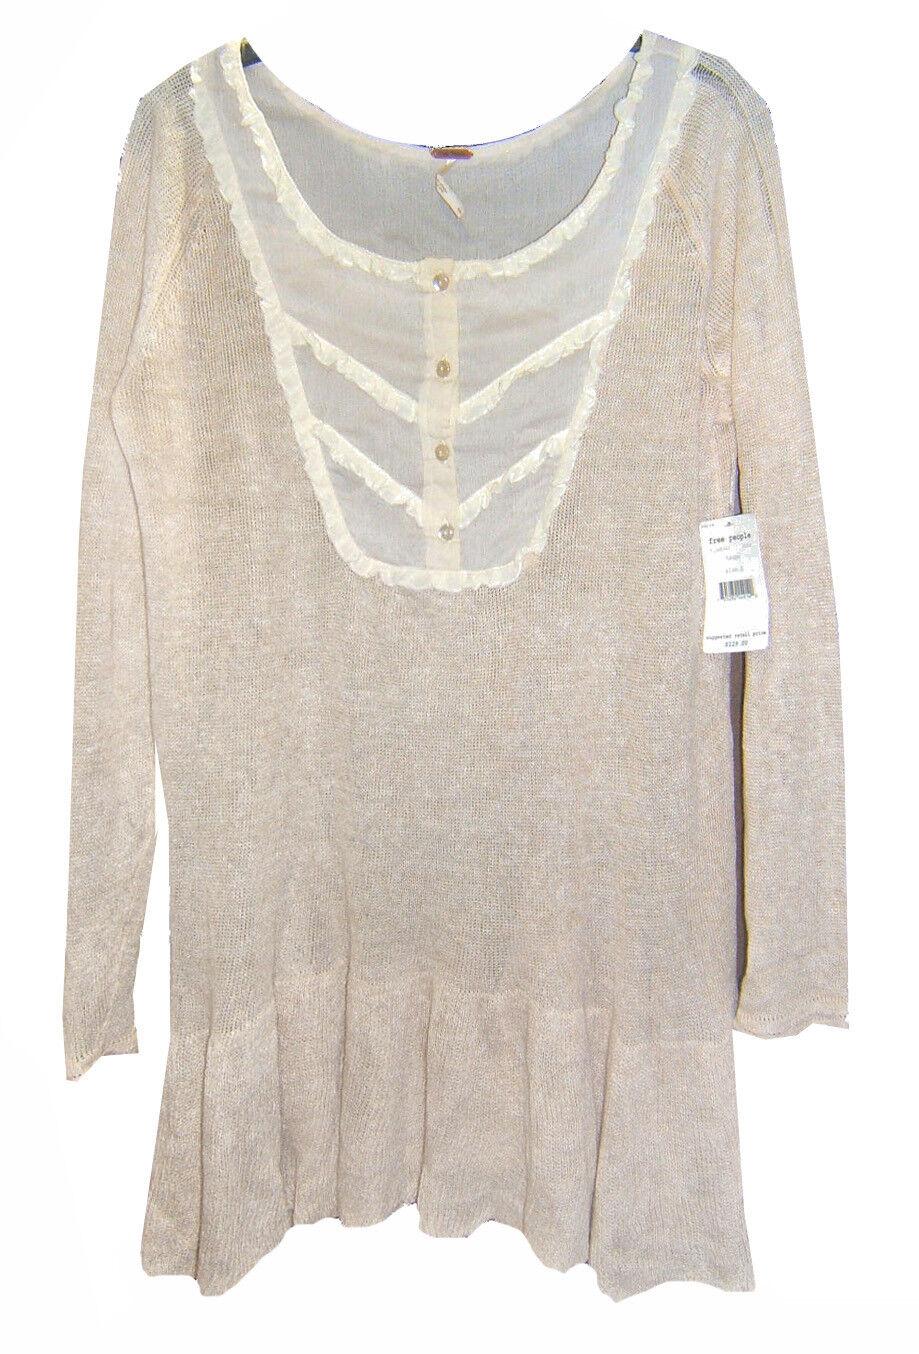 NEW Free People Taupe Linen Peplum Sweater Tunic SZ S 3 4 Sleeves